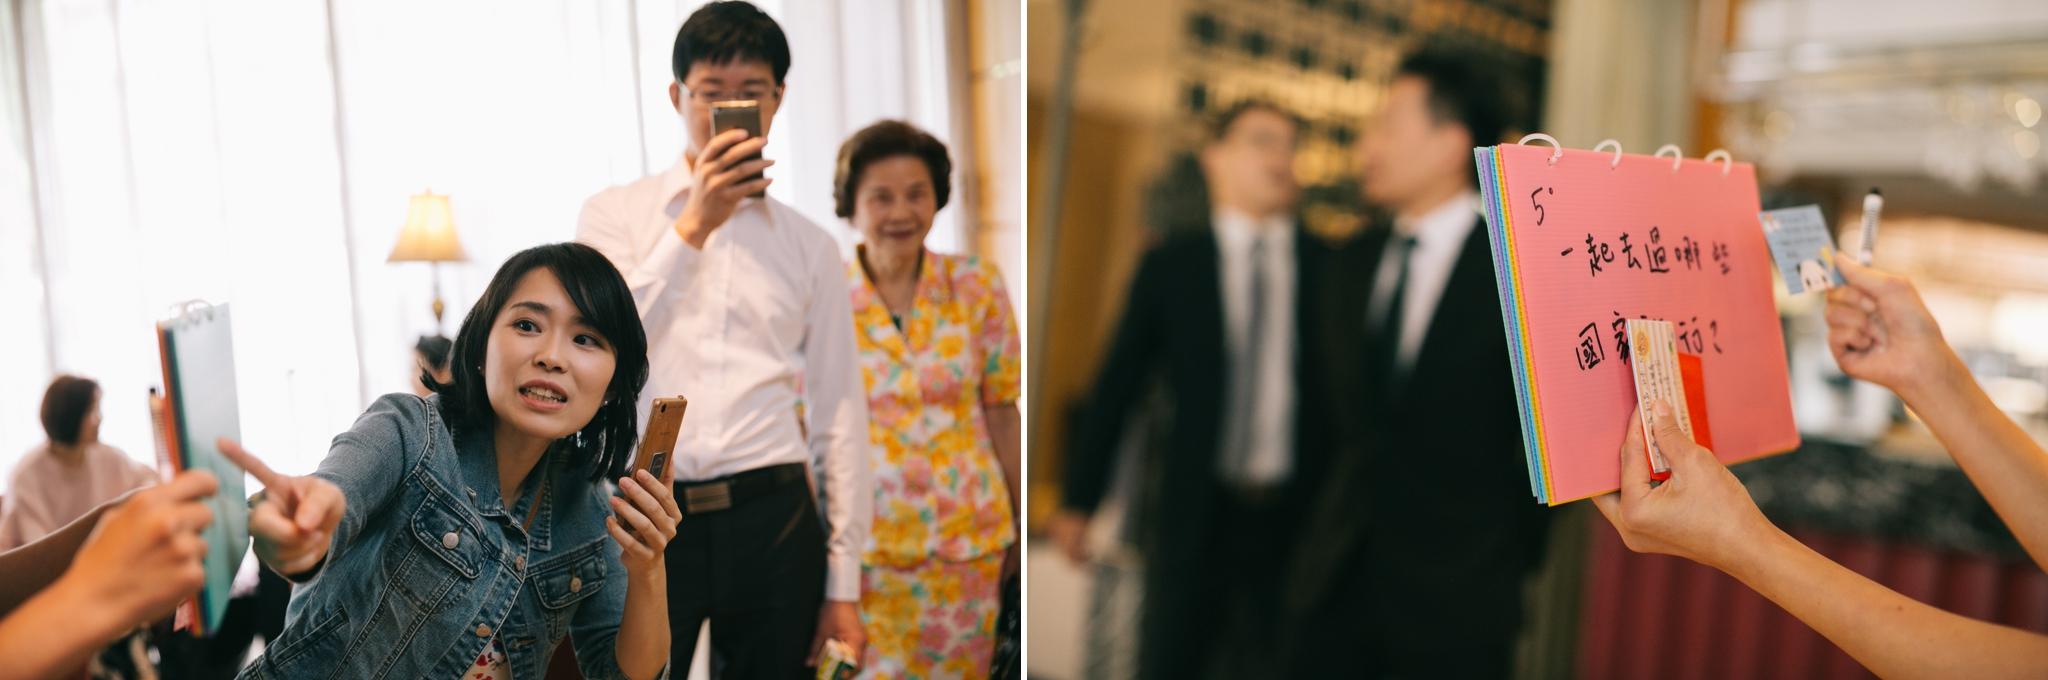 Tina+Nash-wedding-台北婚禮迎娶晚宴-新莊終身大事-036.jpg